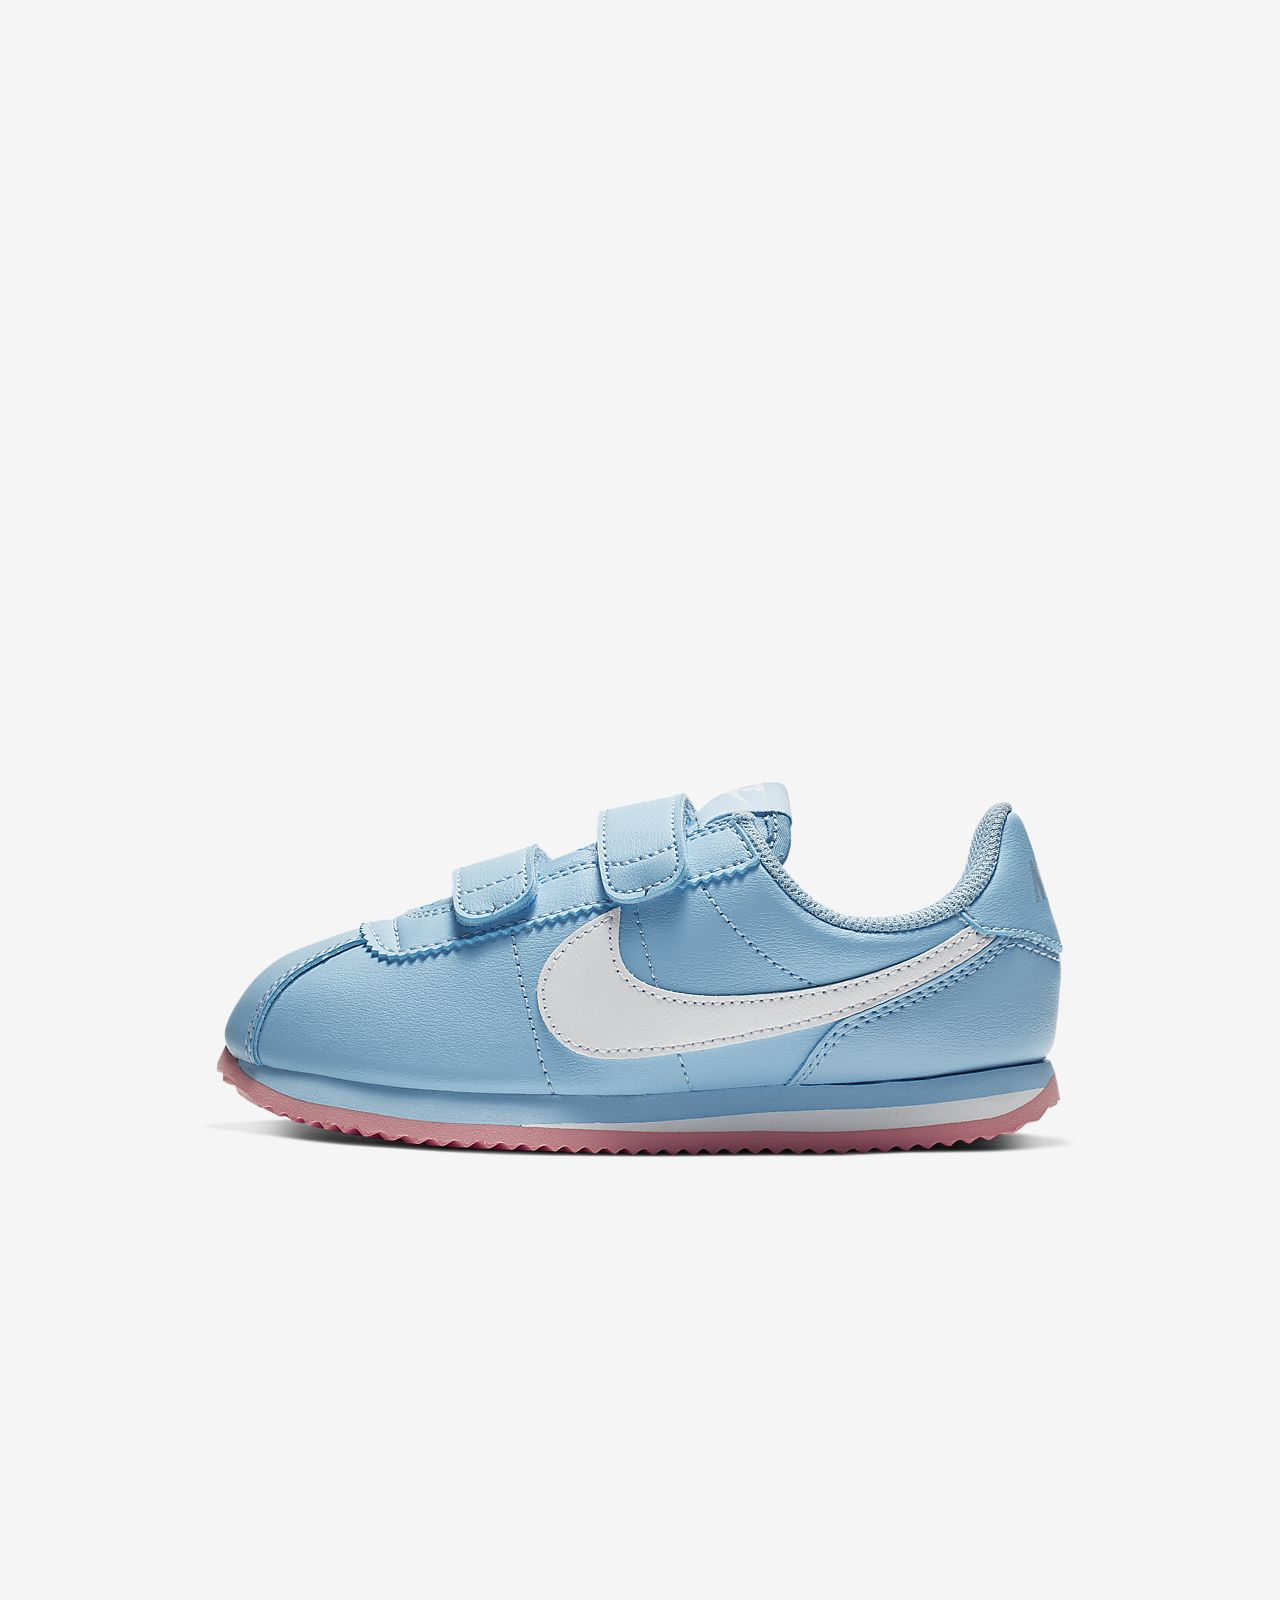 d91b46d43 Nike Cortez Basic SL Little Kids  Shoe. Nike.com